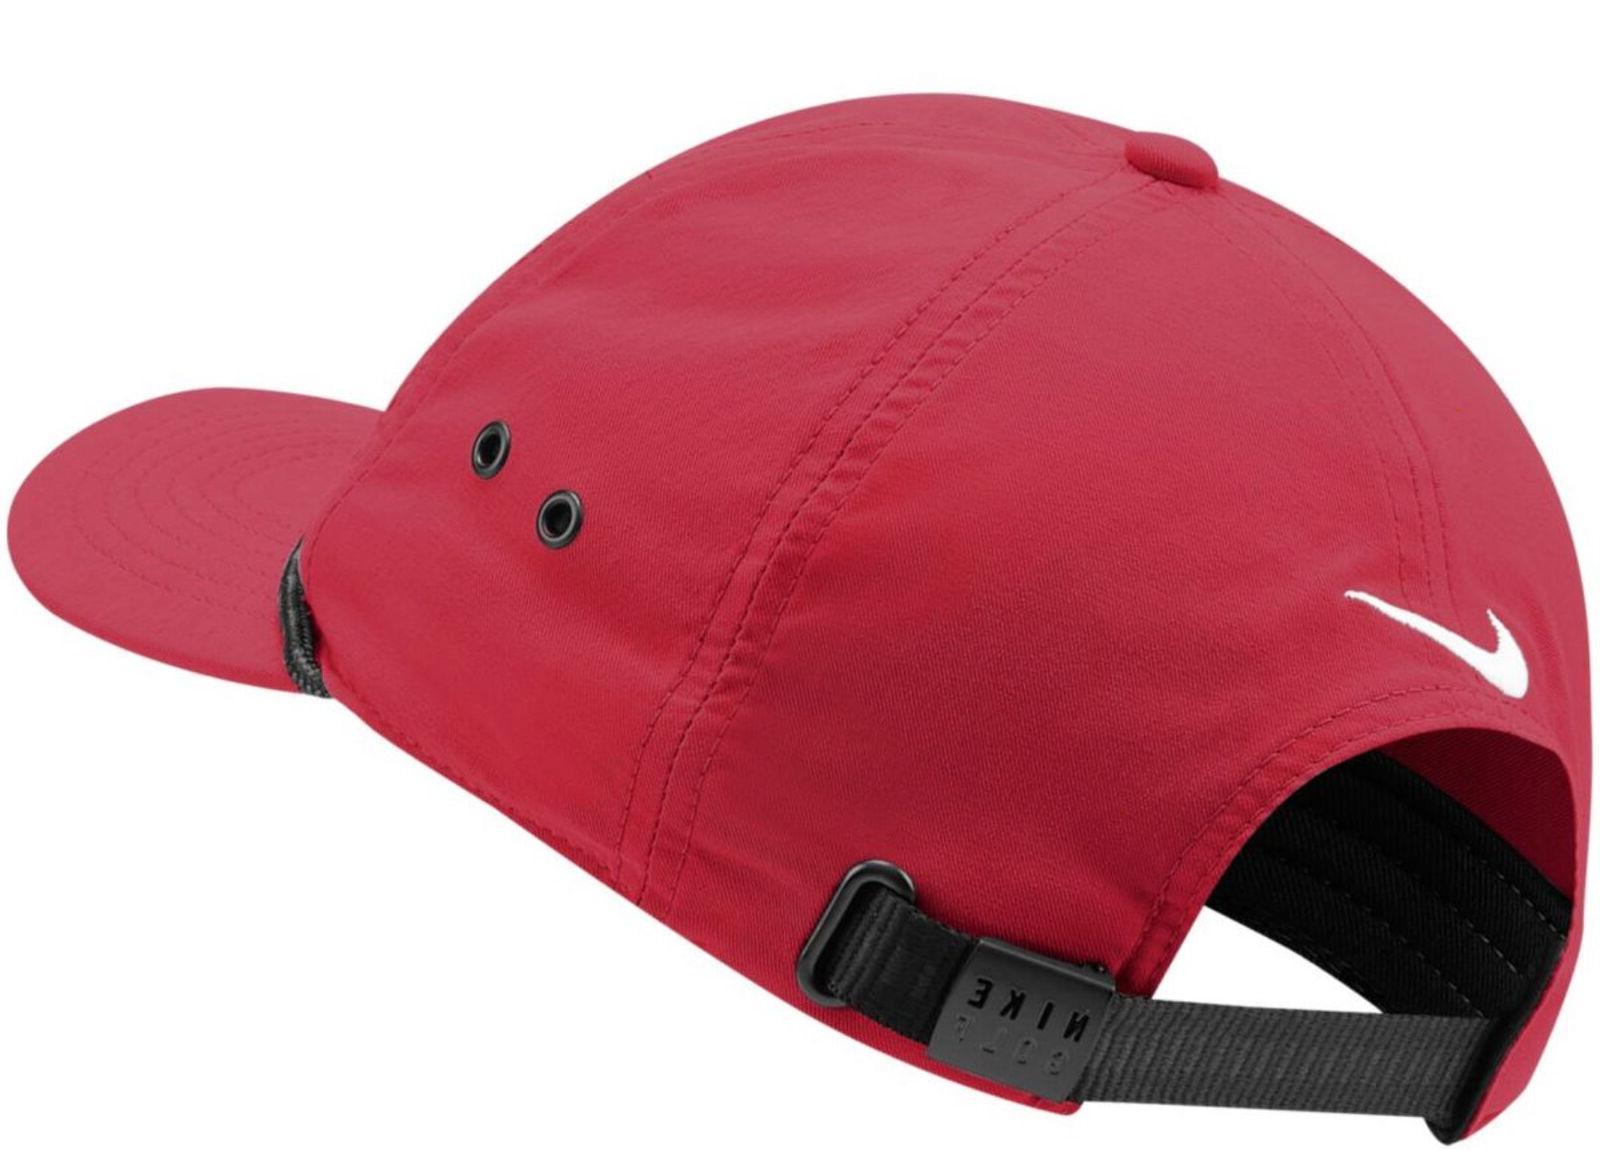 Nike Unisex Golf Classic Hat DRI-FIT Cap Red/White BV8229